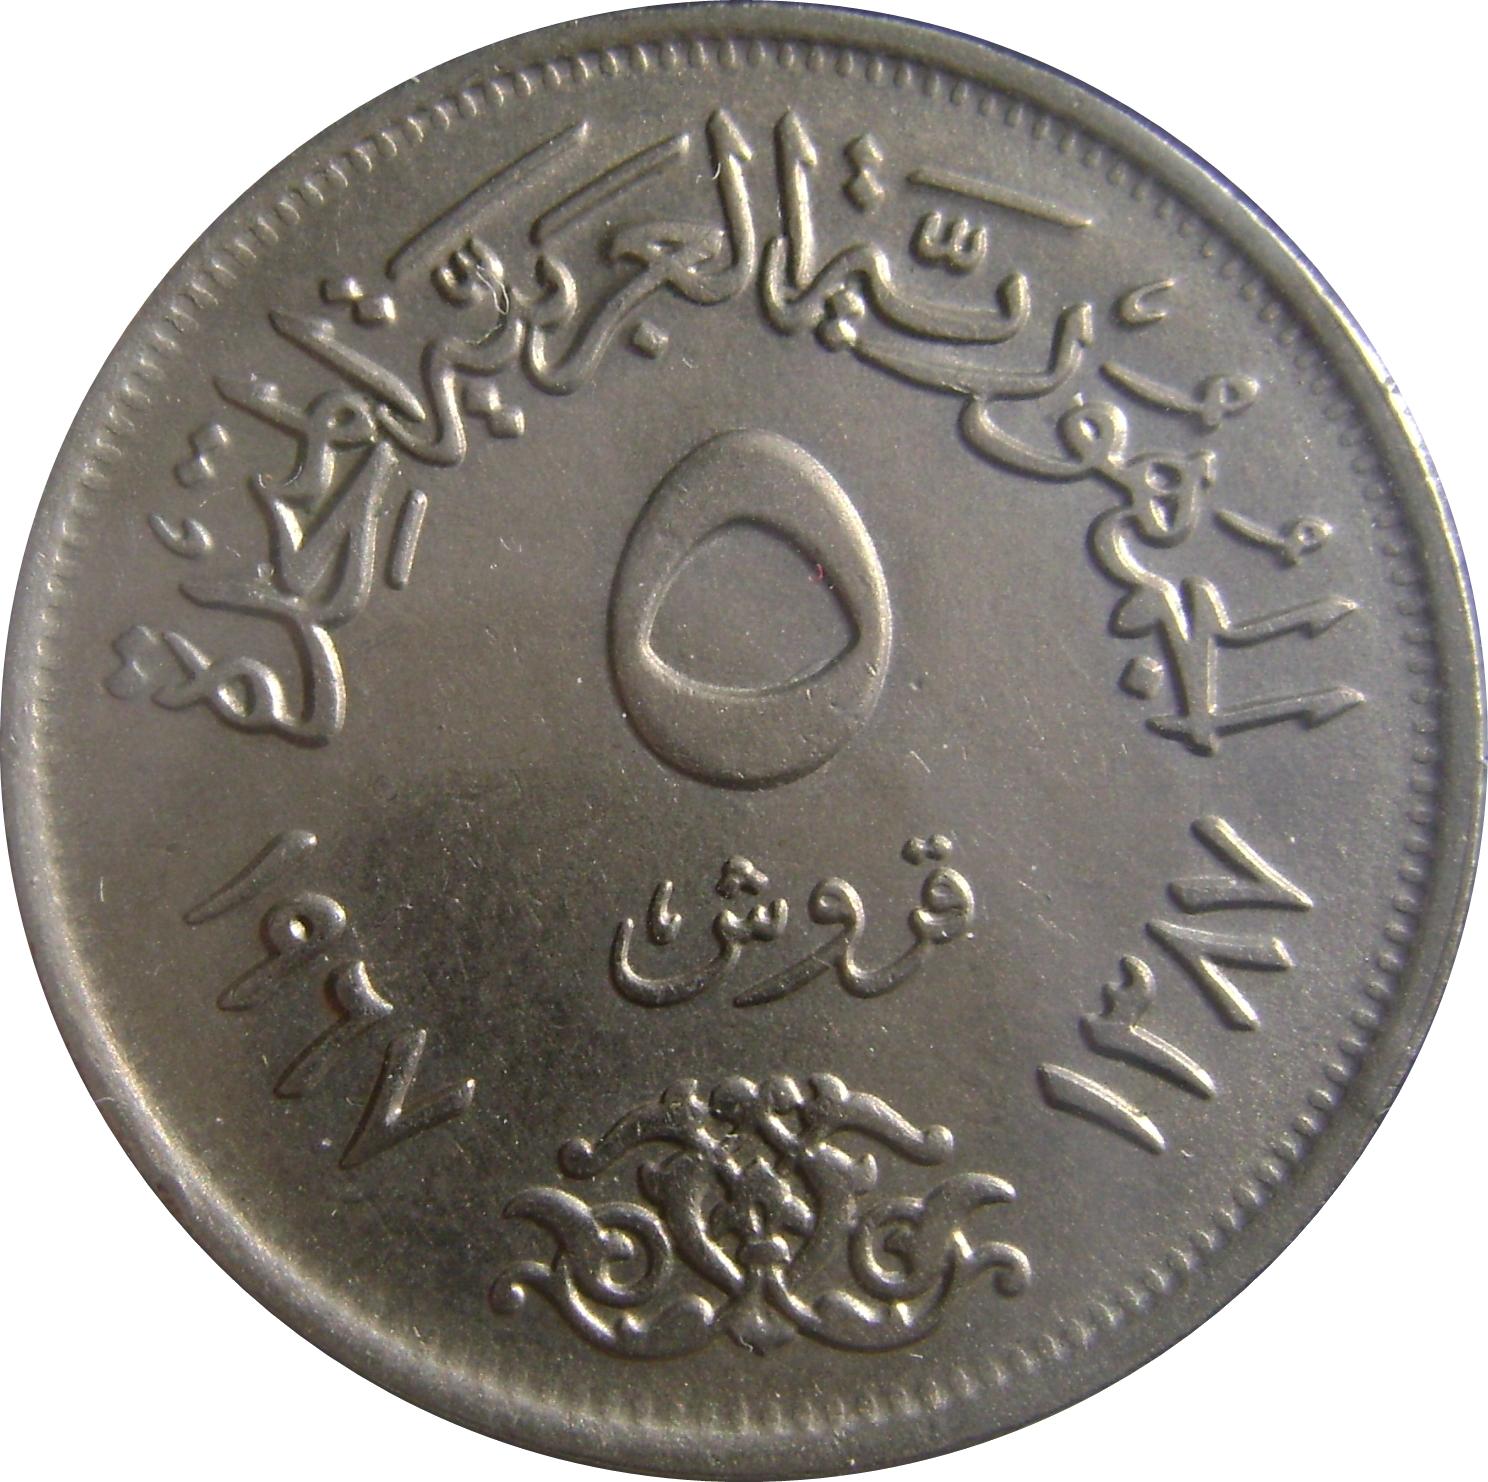 1967 Egypt 5 Piastres Eagle with Shield BU Coin